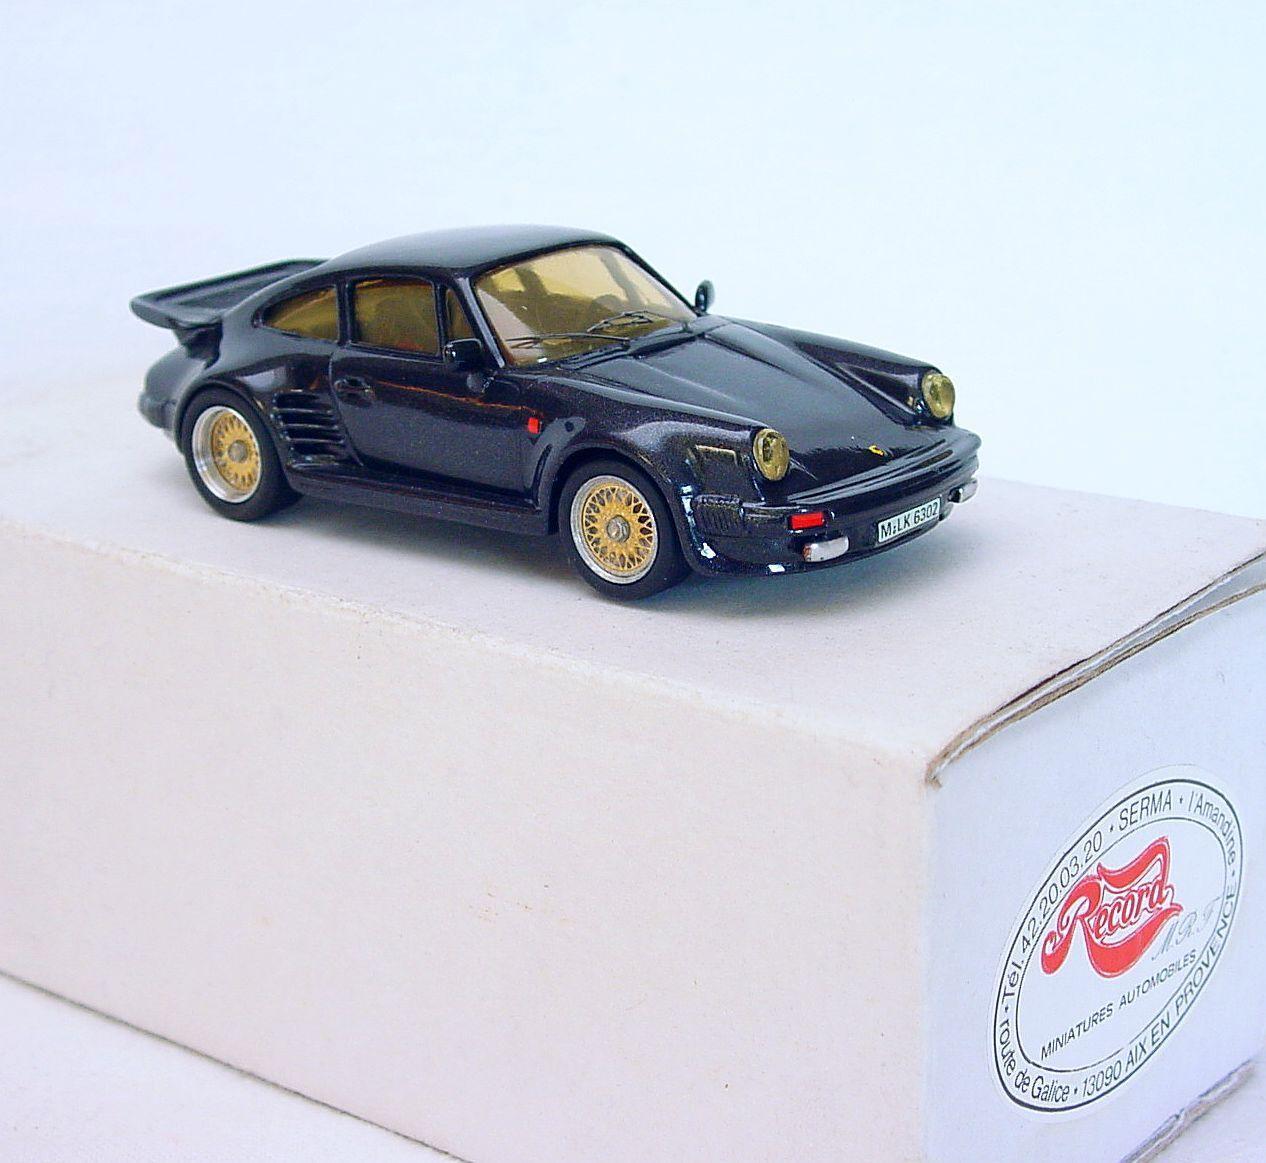 RECORD MODELS 1 43 PORSCHE 930 Turbo  SALON DE GENEVE  RESIN KIT VOITURE MAIN construit Comme neuf IN BOX